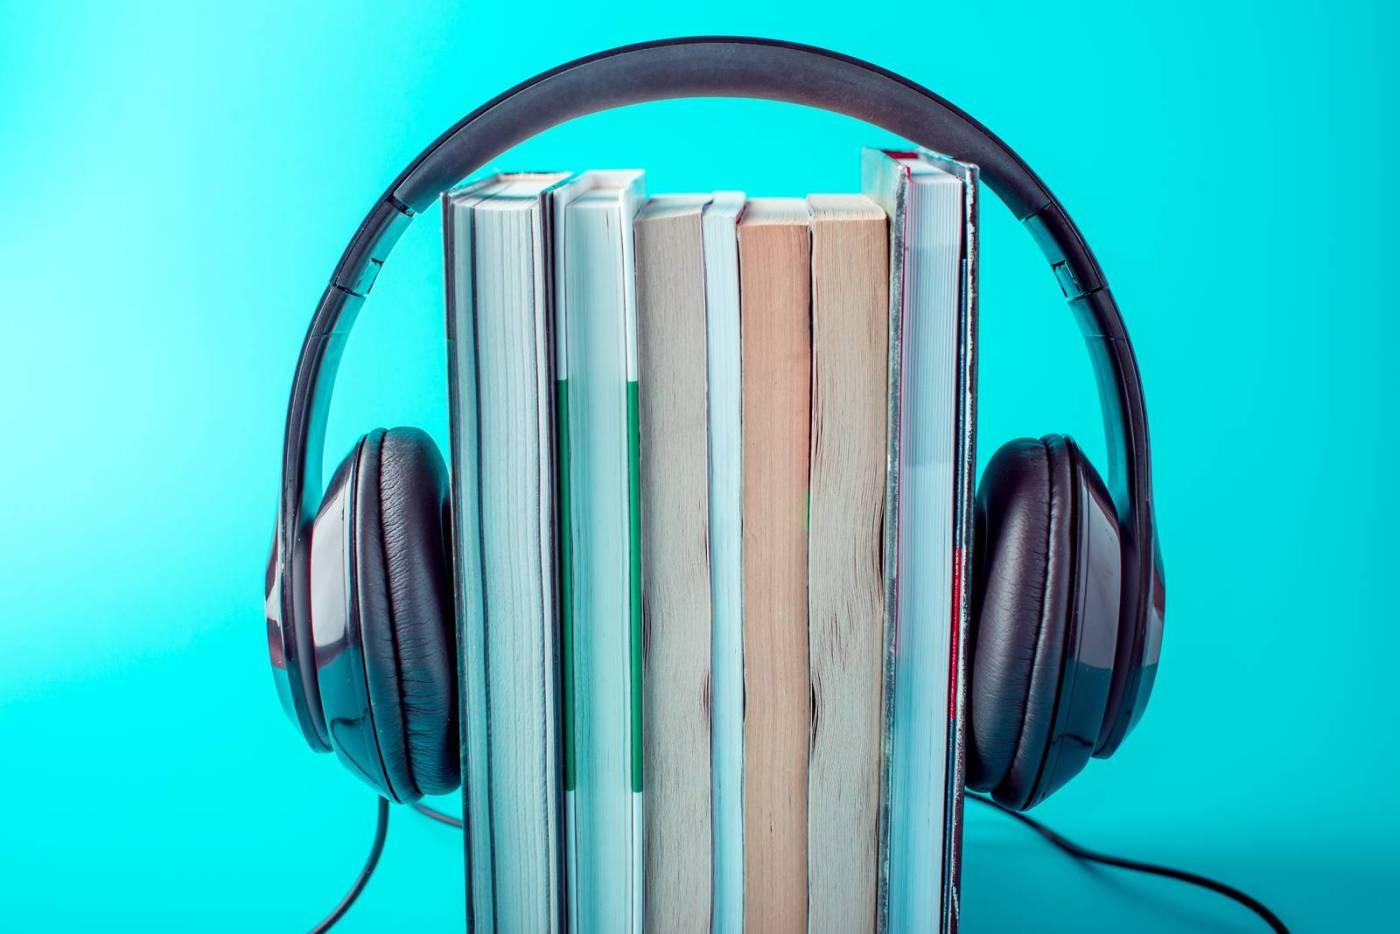 Audiobooks Vs Paper